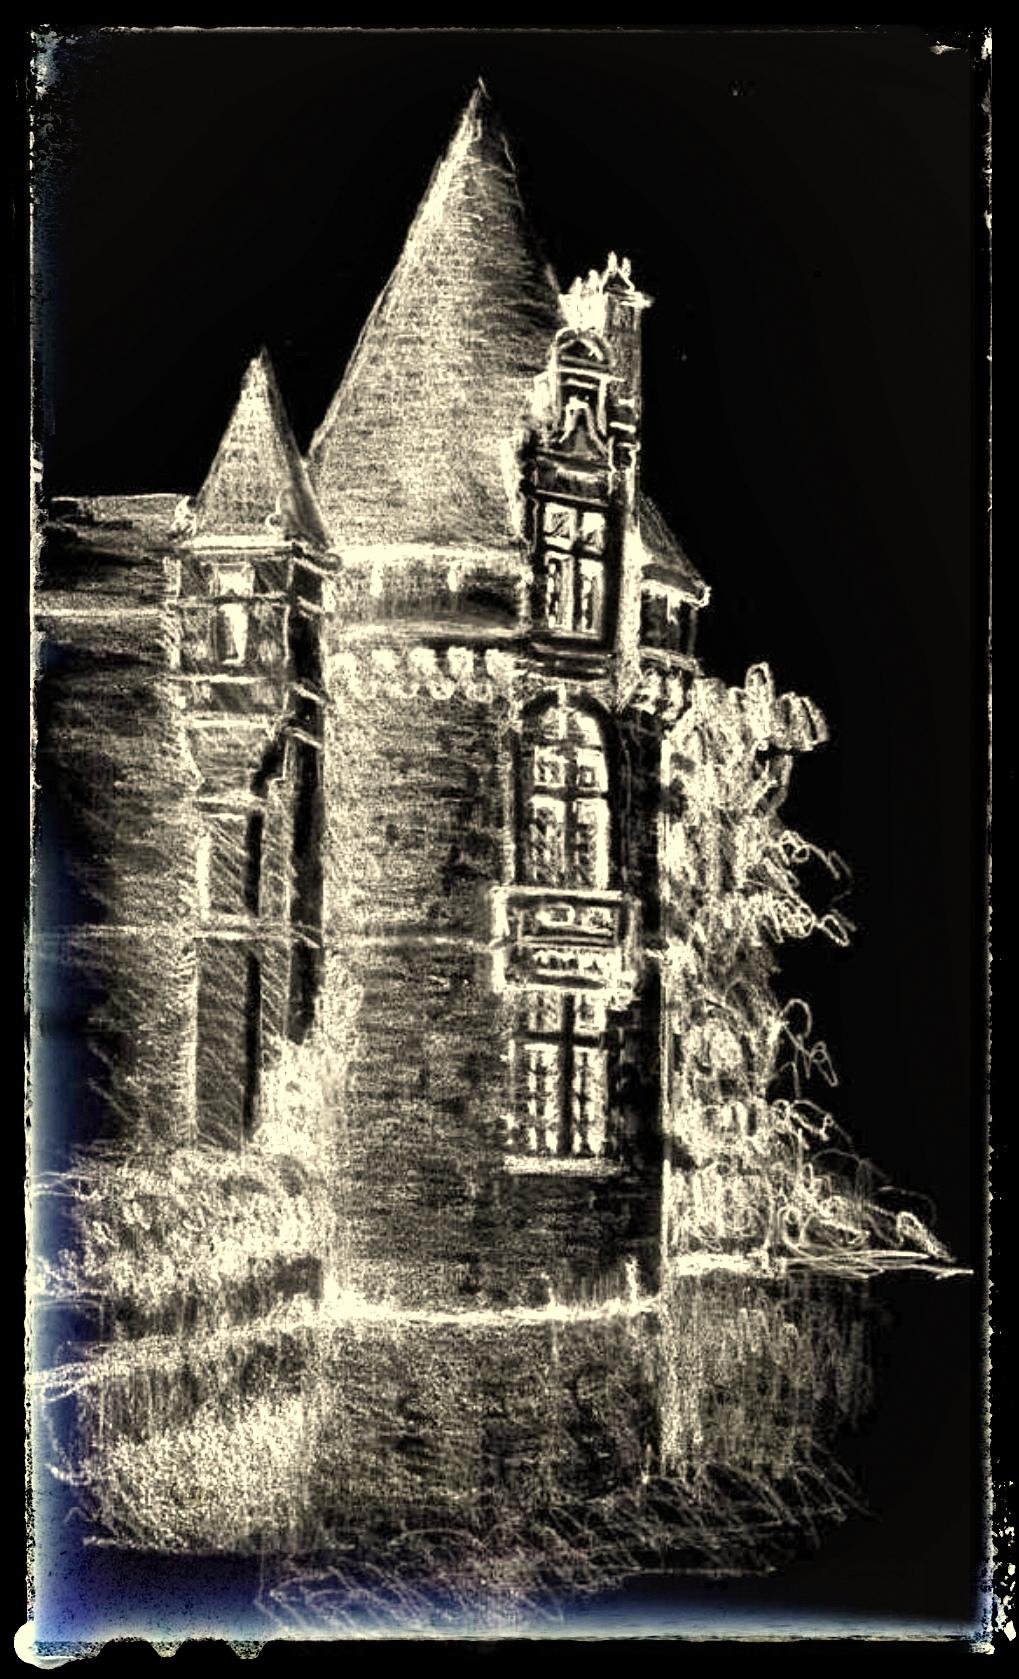 Luxemburg castle